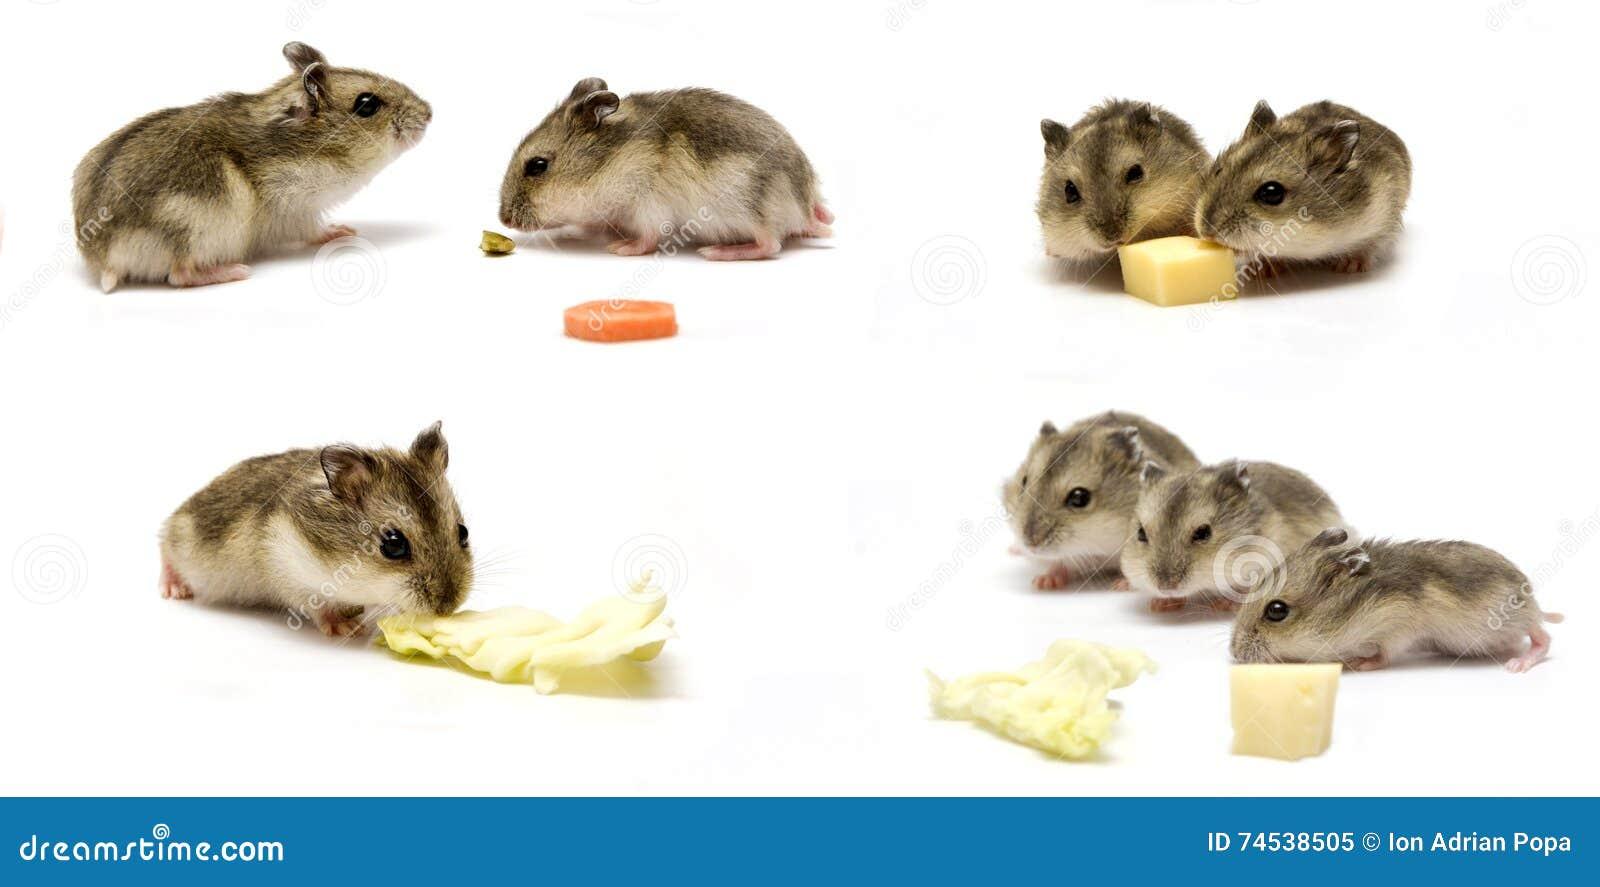 Hamster babies stock image  Image of life, humorous, hair